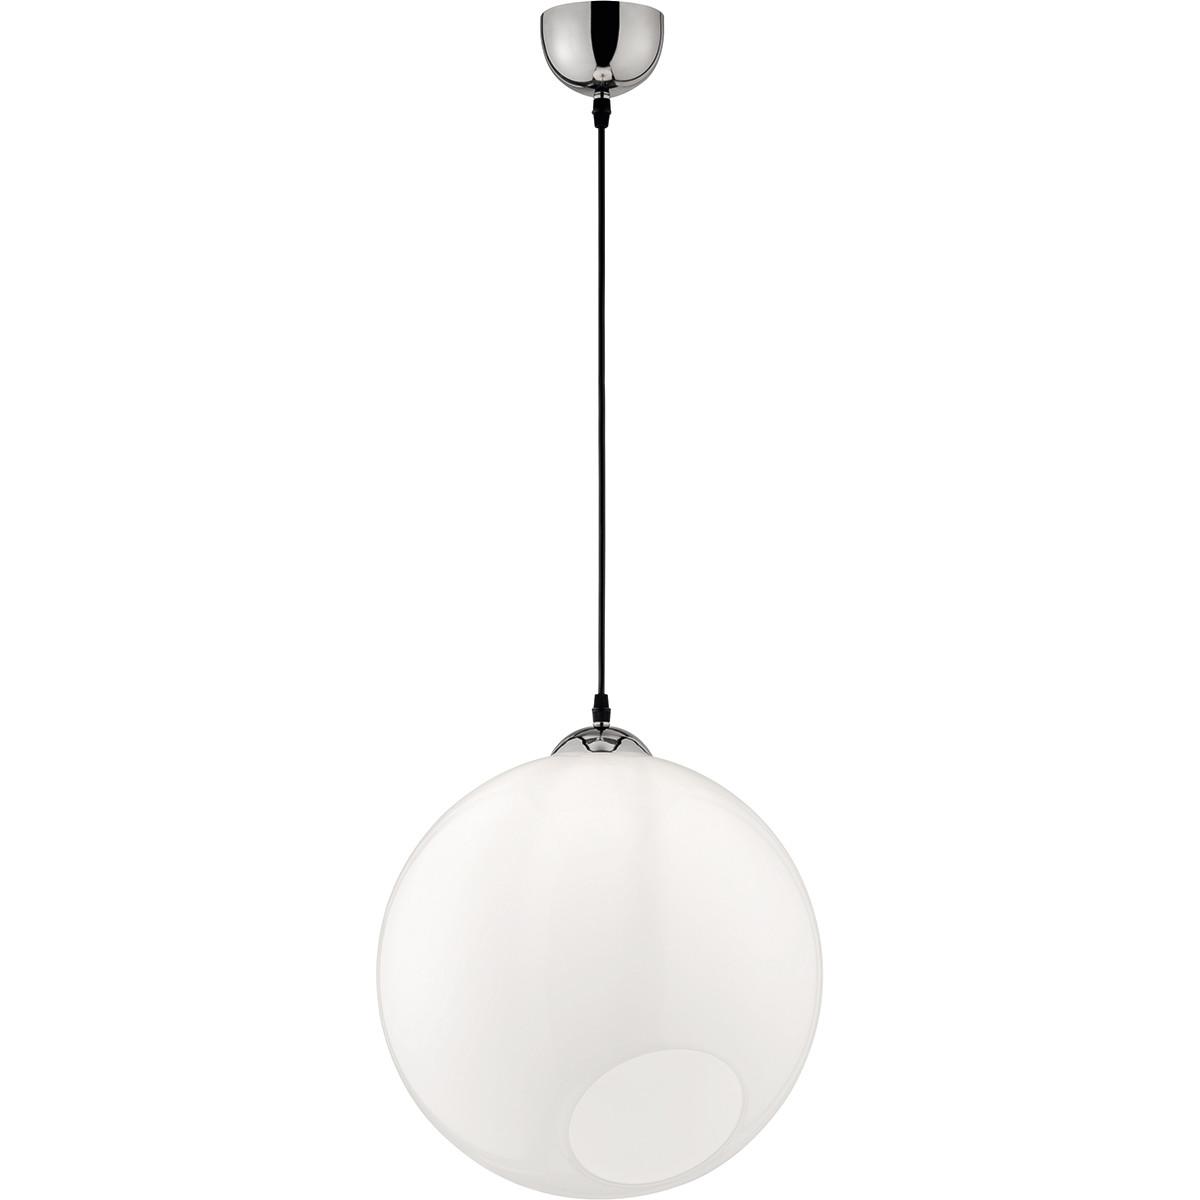 LED Hanglamp - Trion Klino XL - E27 Fitting - 1-lichts - Rond - Mat Chroom - Aluminium